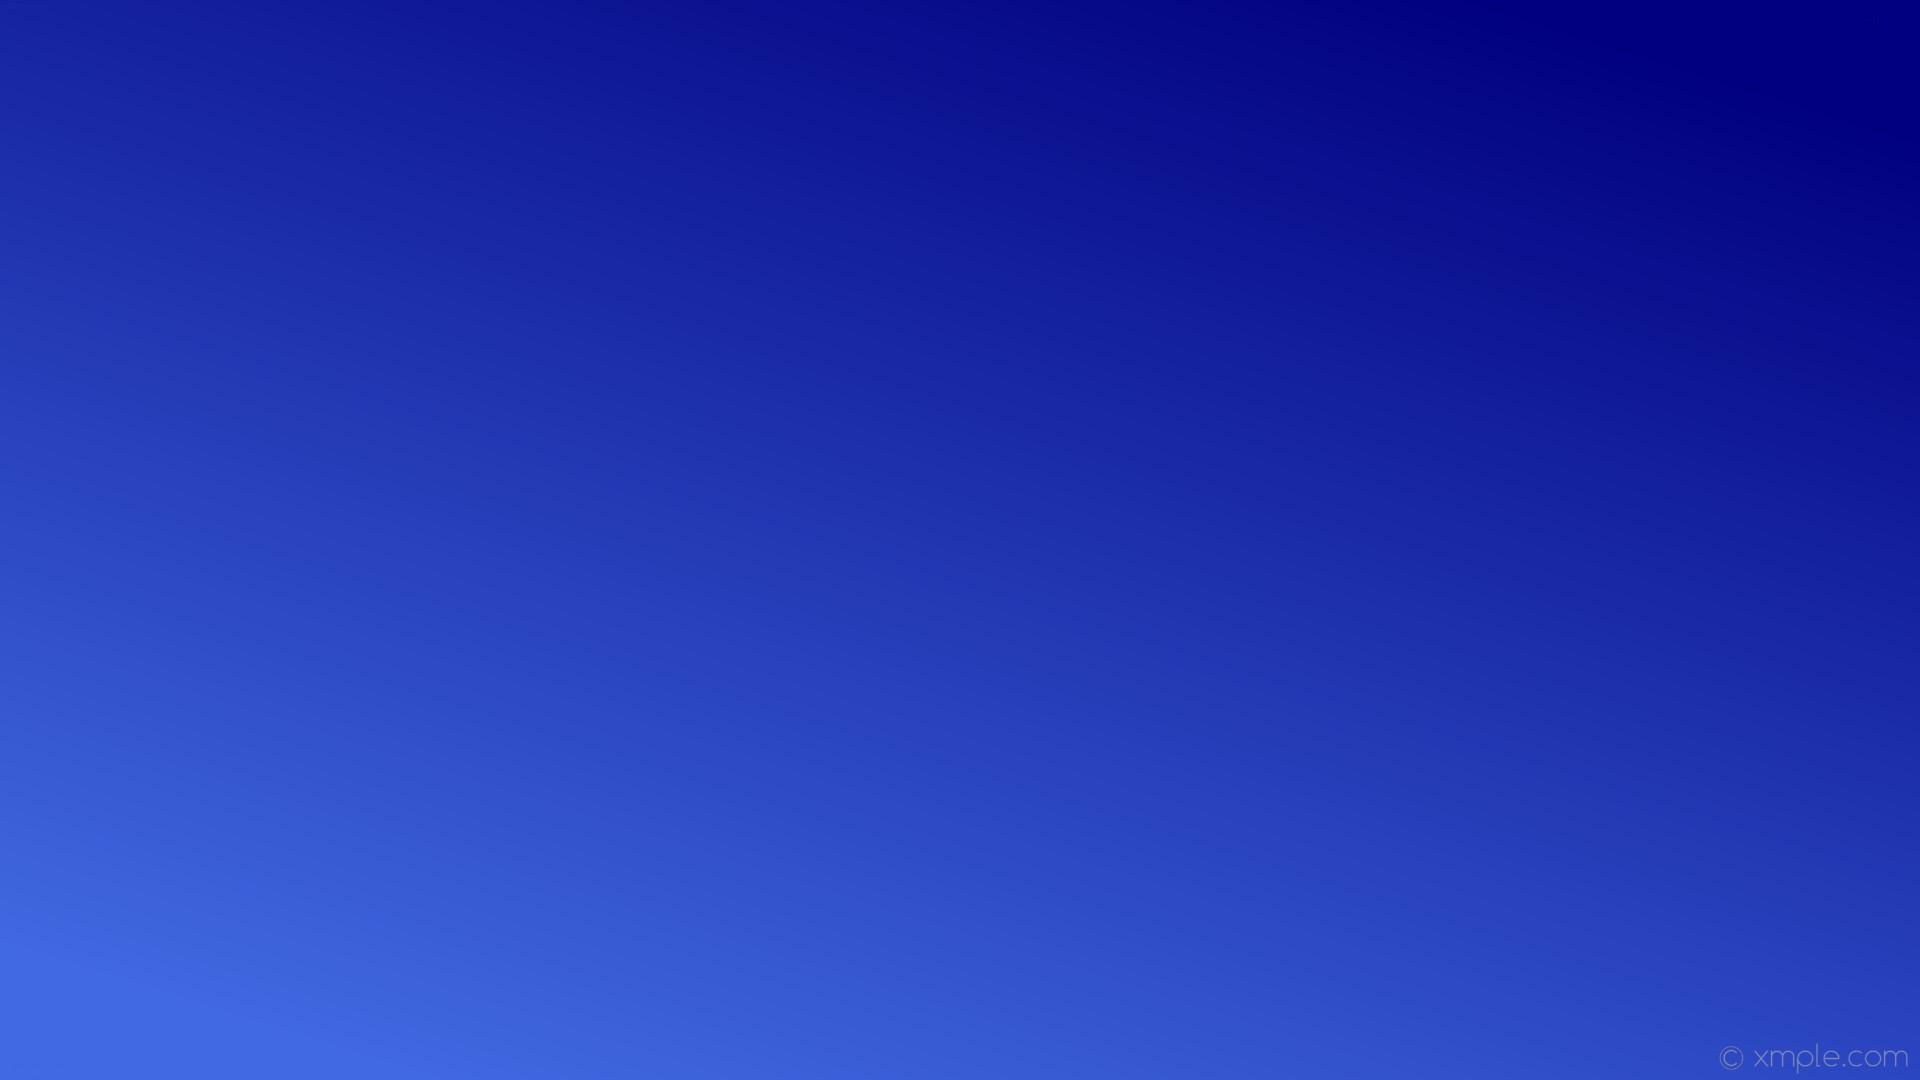 wallpaper blue gradient linear royal blue navy #4169e1 #000080 225°